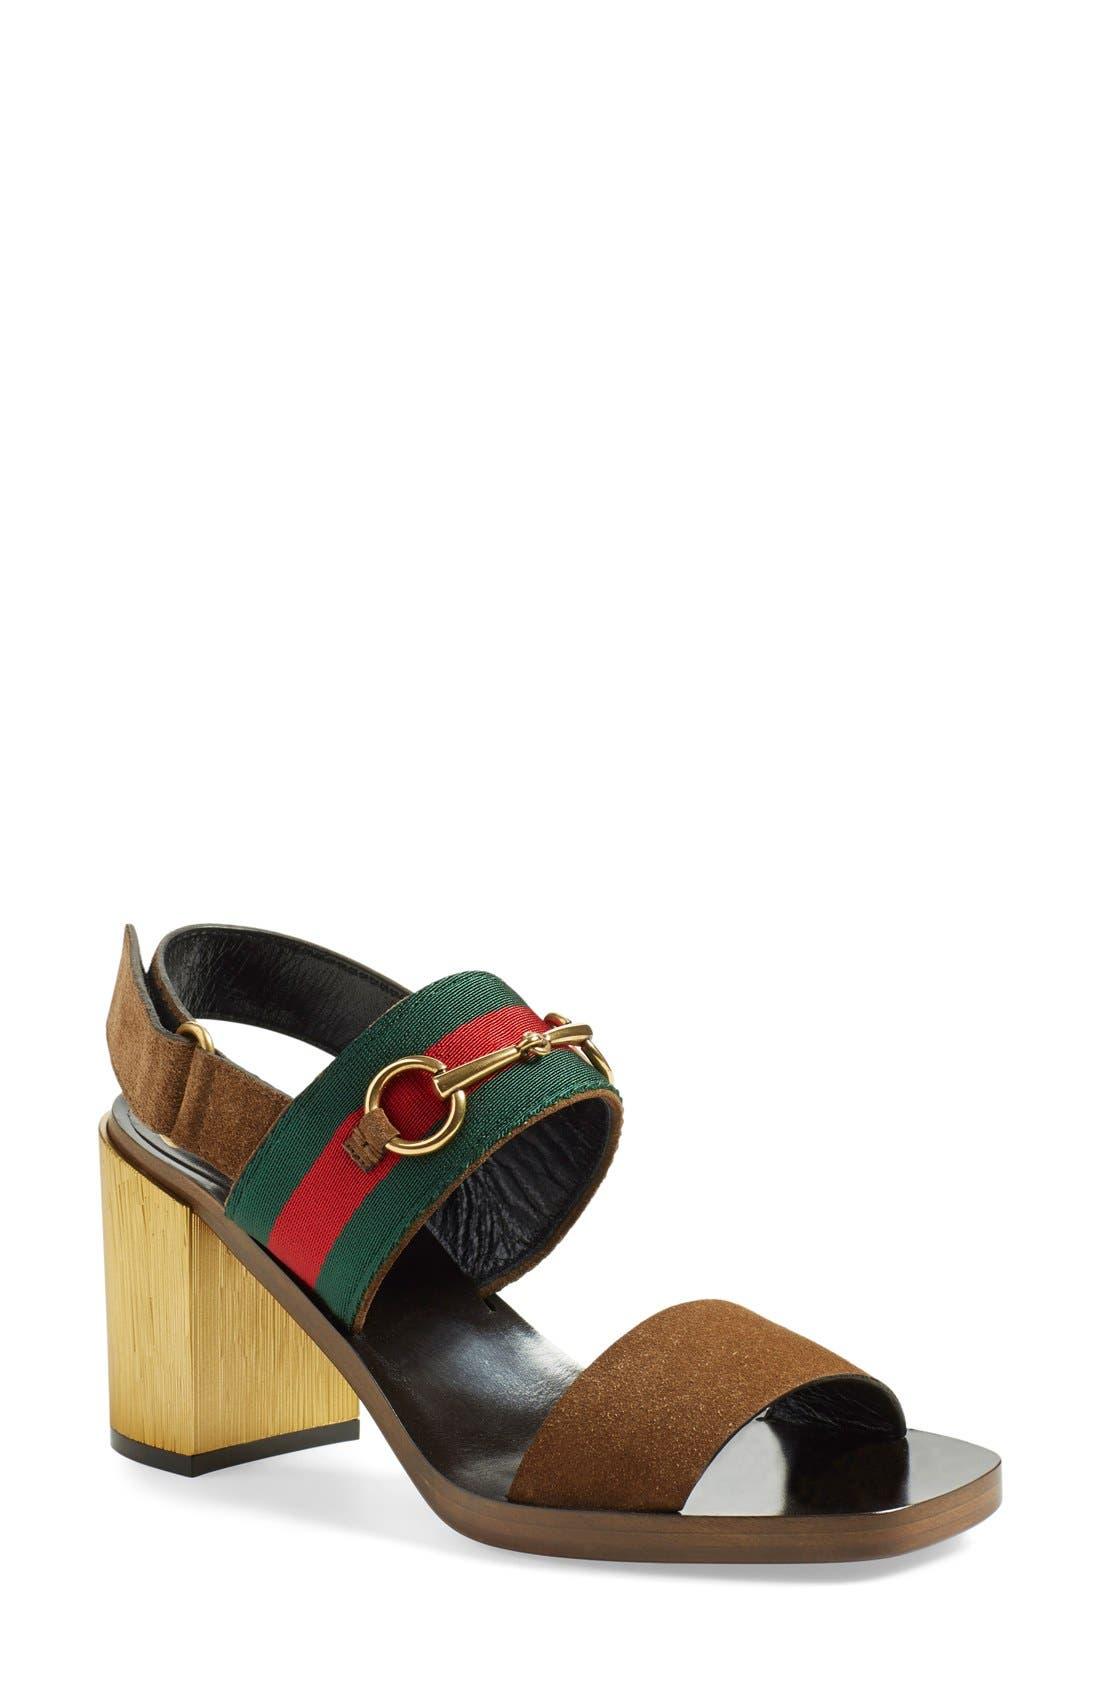 'Querelle' Horsebit Slingback Sandal, Main, color, 250